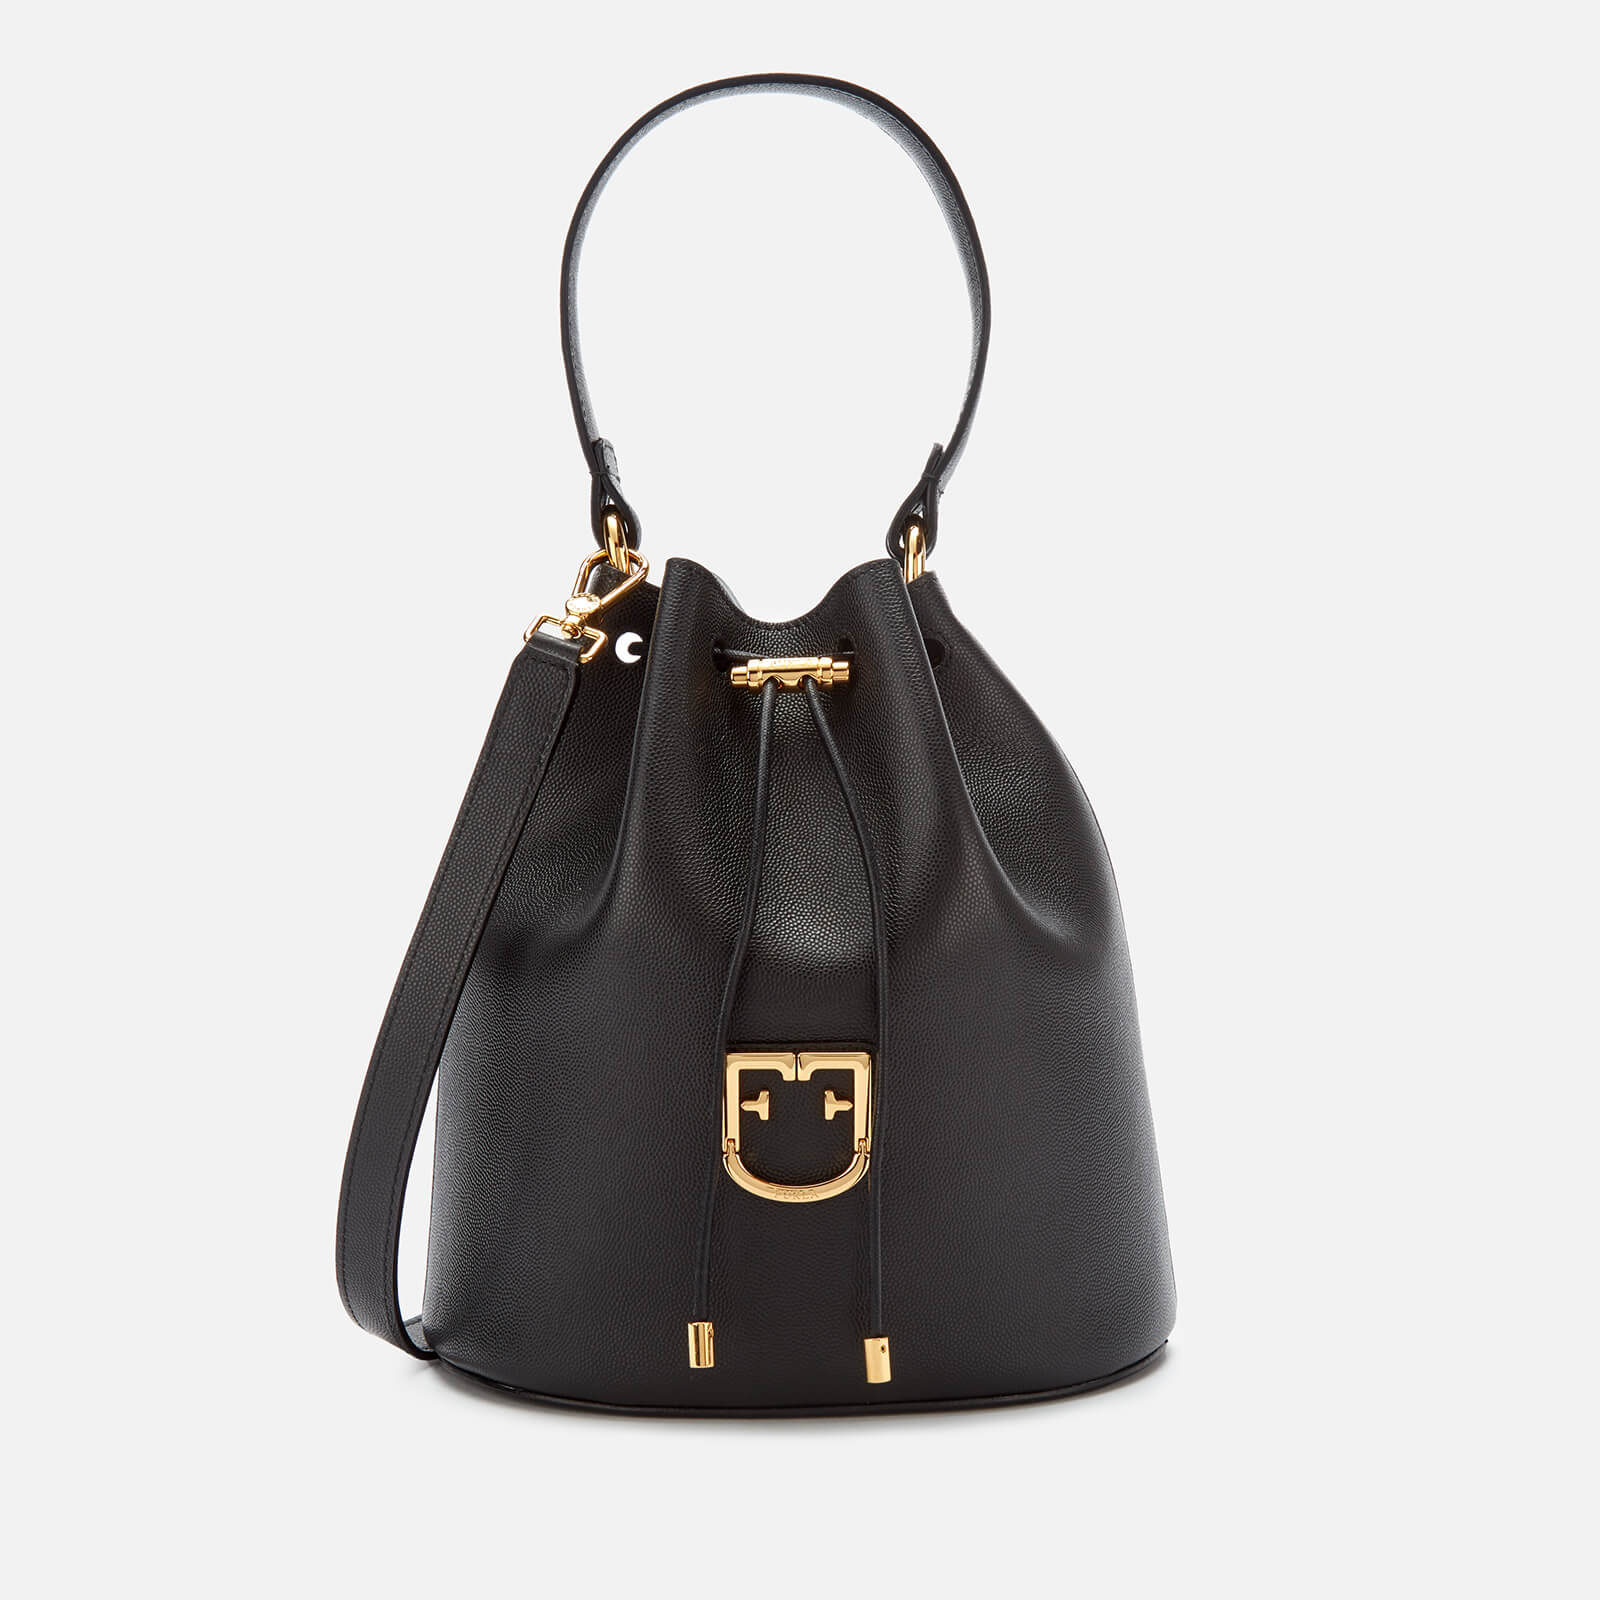 Furla Women's Corona S Drawstring Bag - Onyx